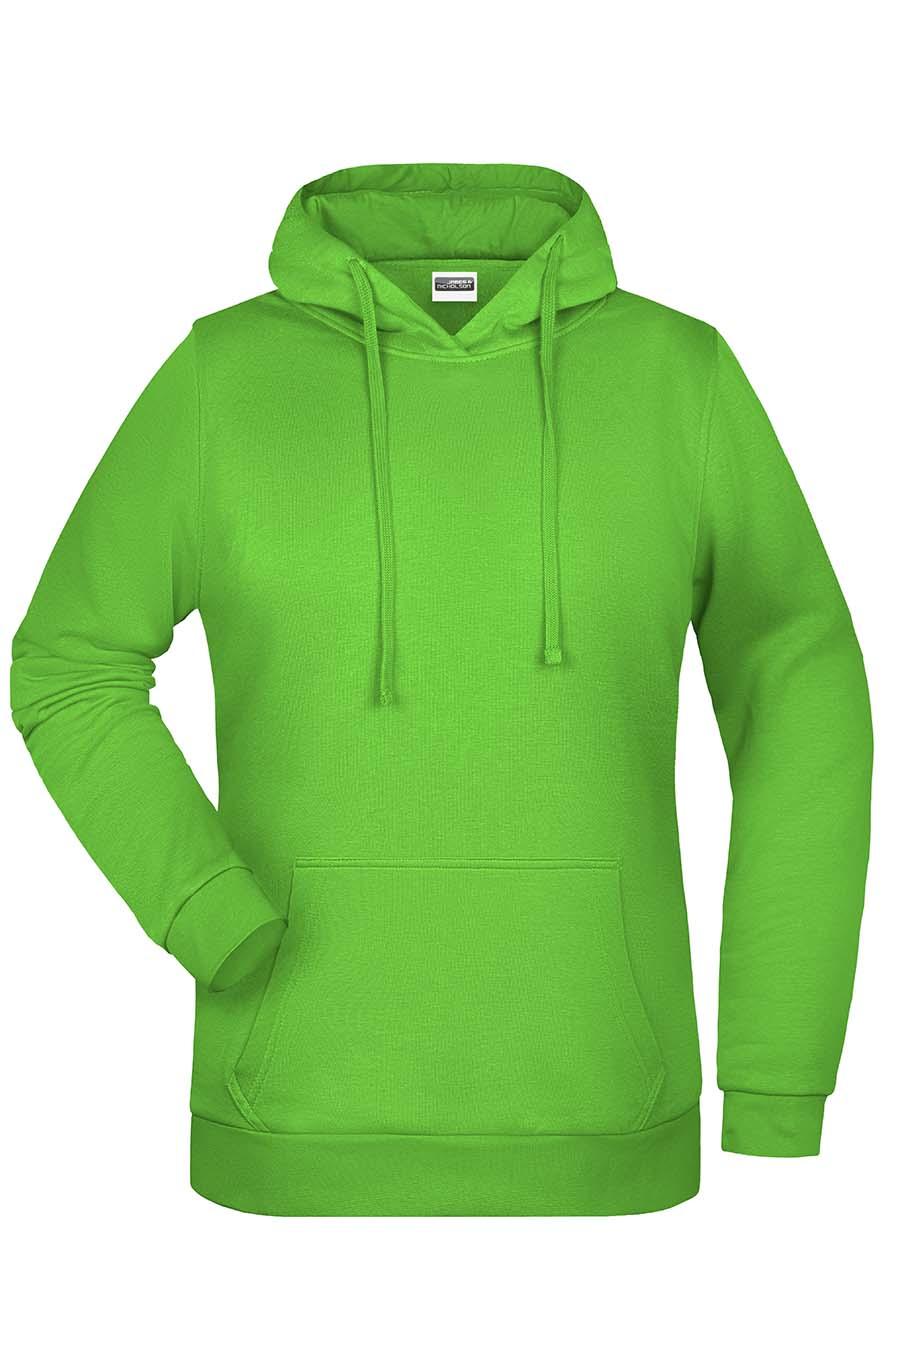 Sweat-shirt capuche femme - 20-1494-12